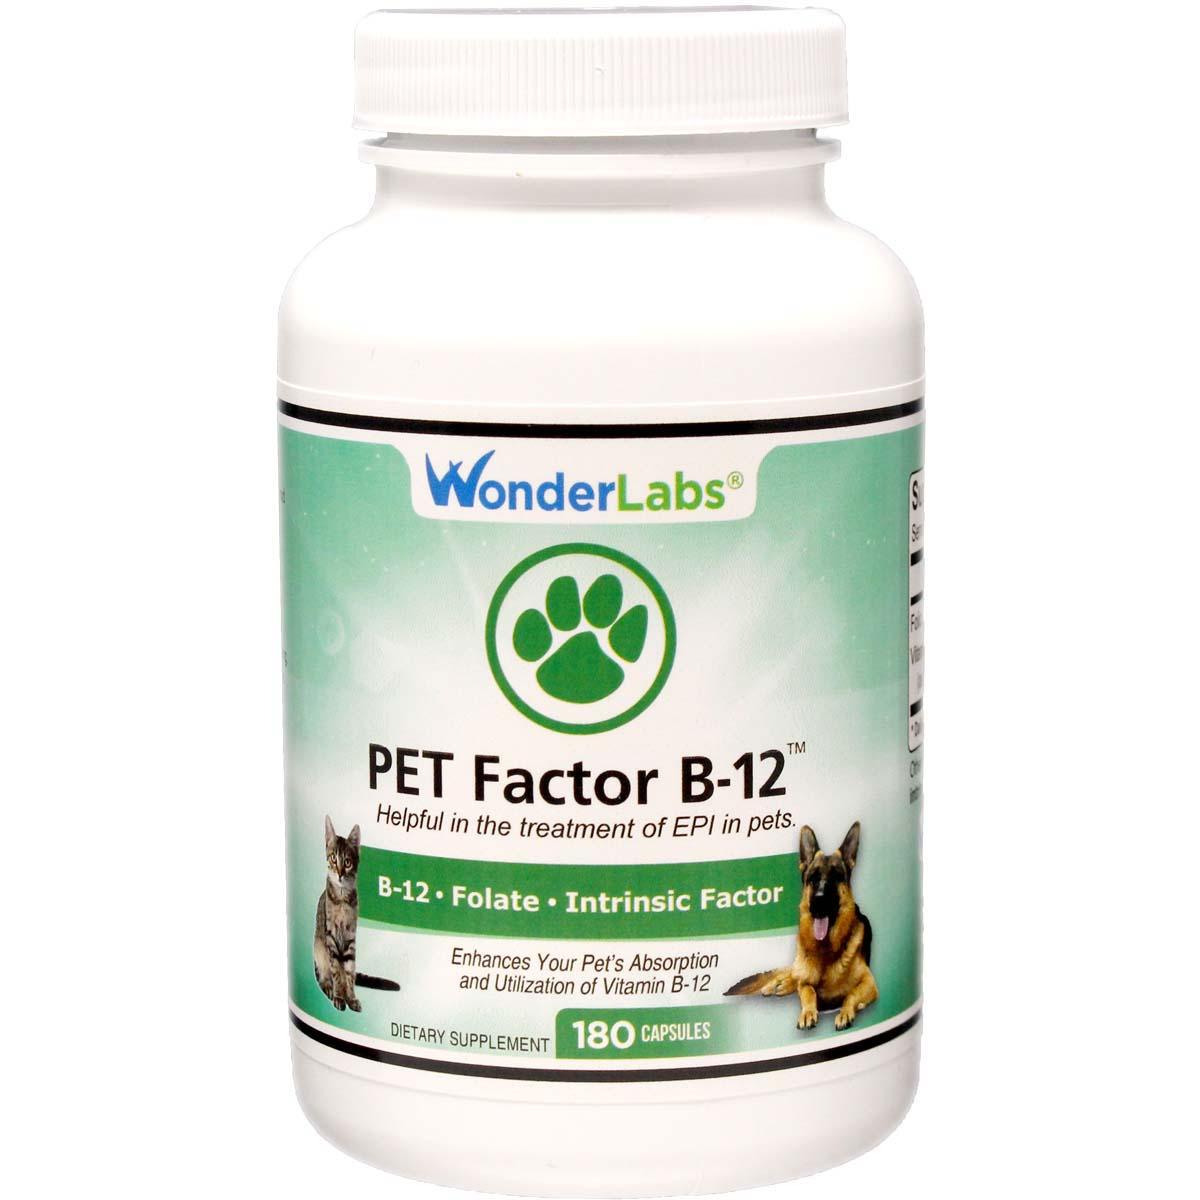 Pet Factor B-12 W/ Intrinsic Factor